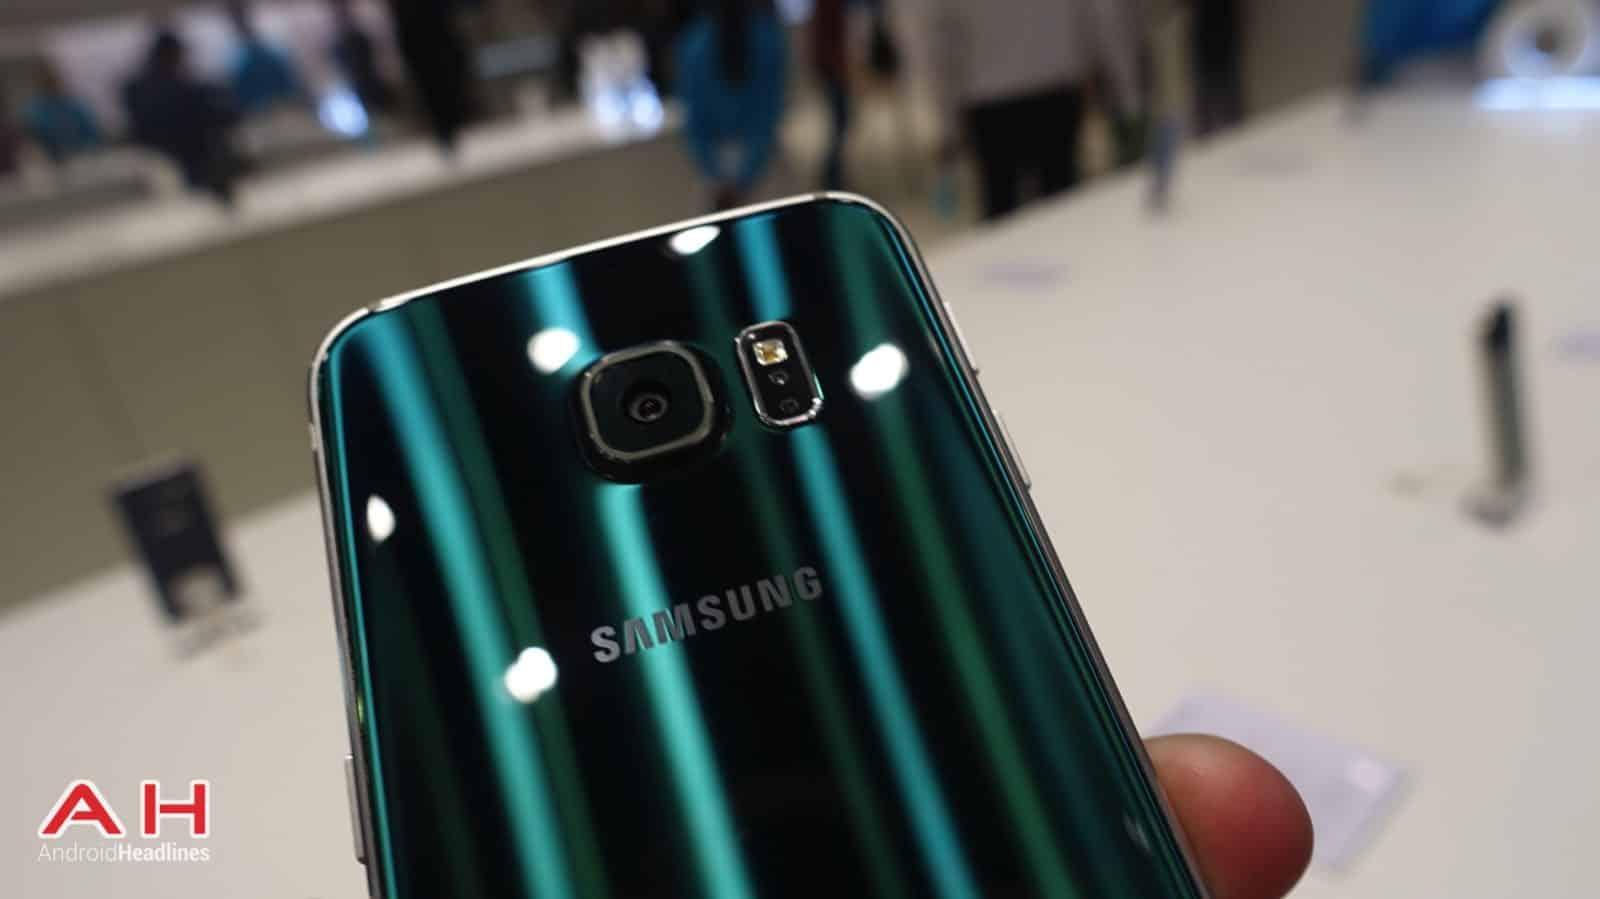 Galaxy S6 and Galaxy S6 Edge MWC AH 29